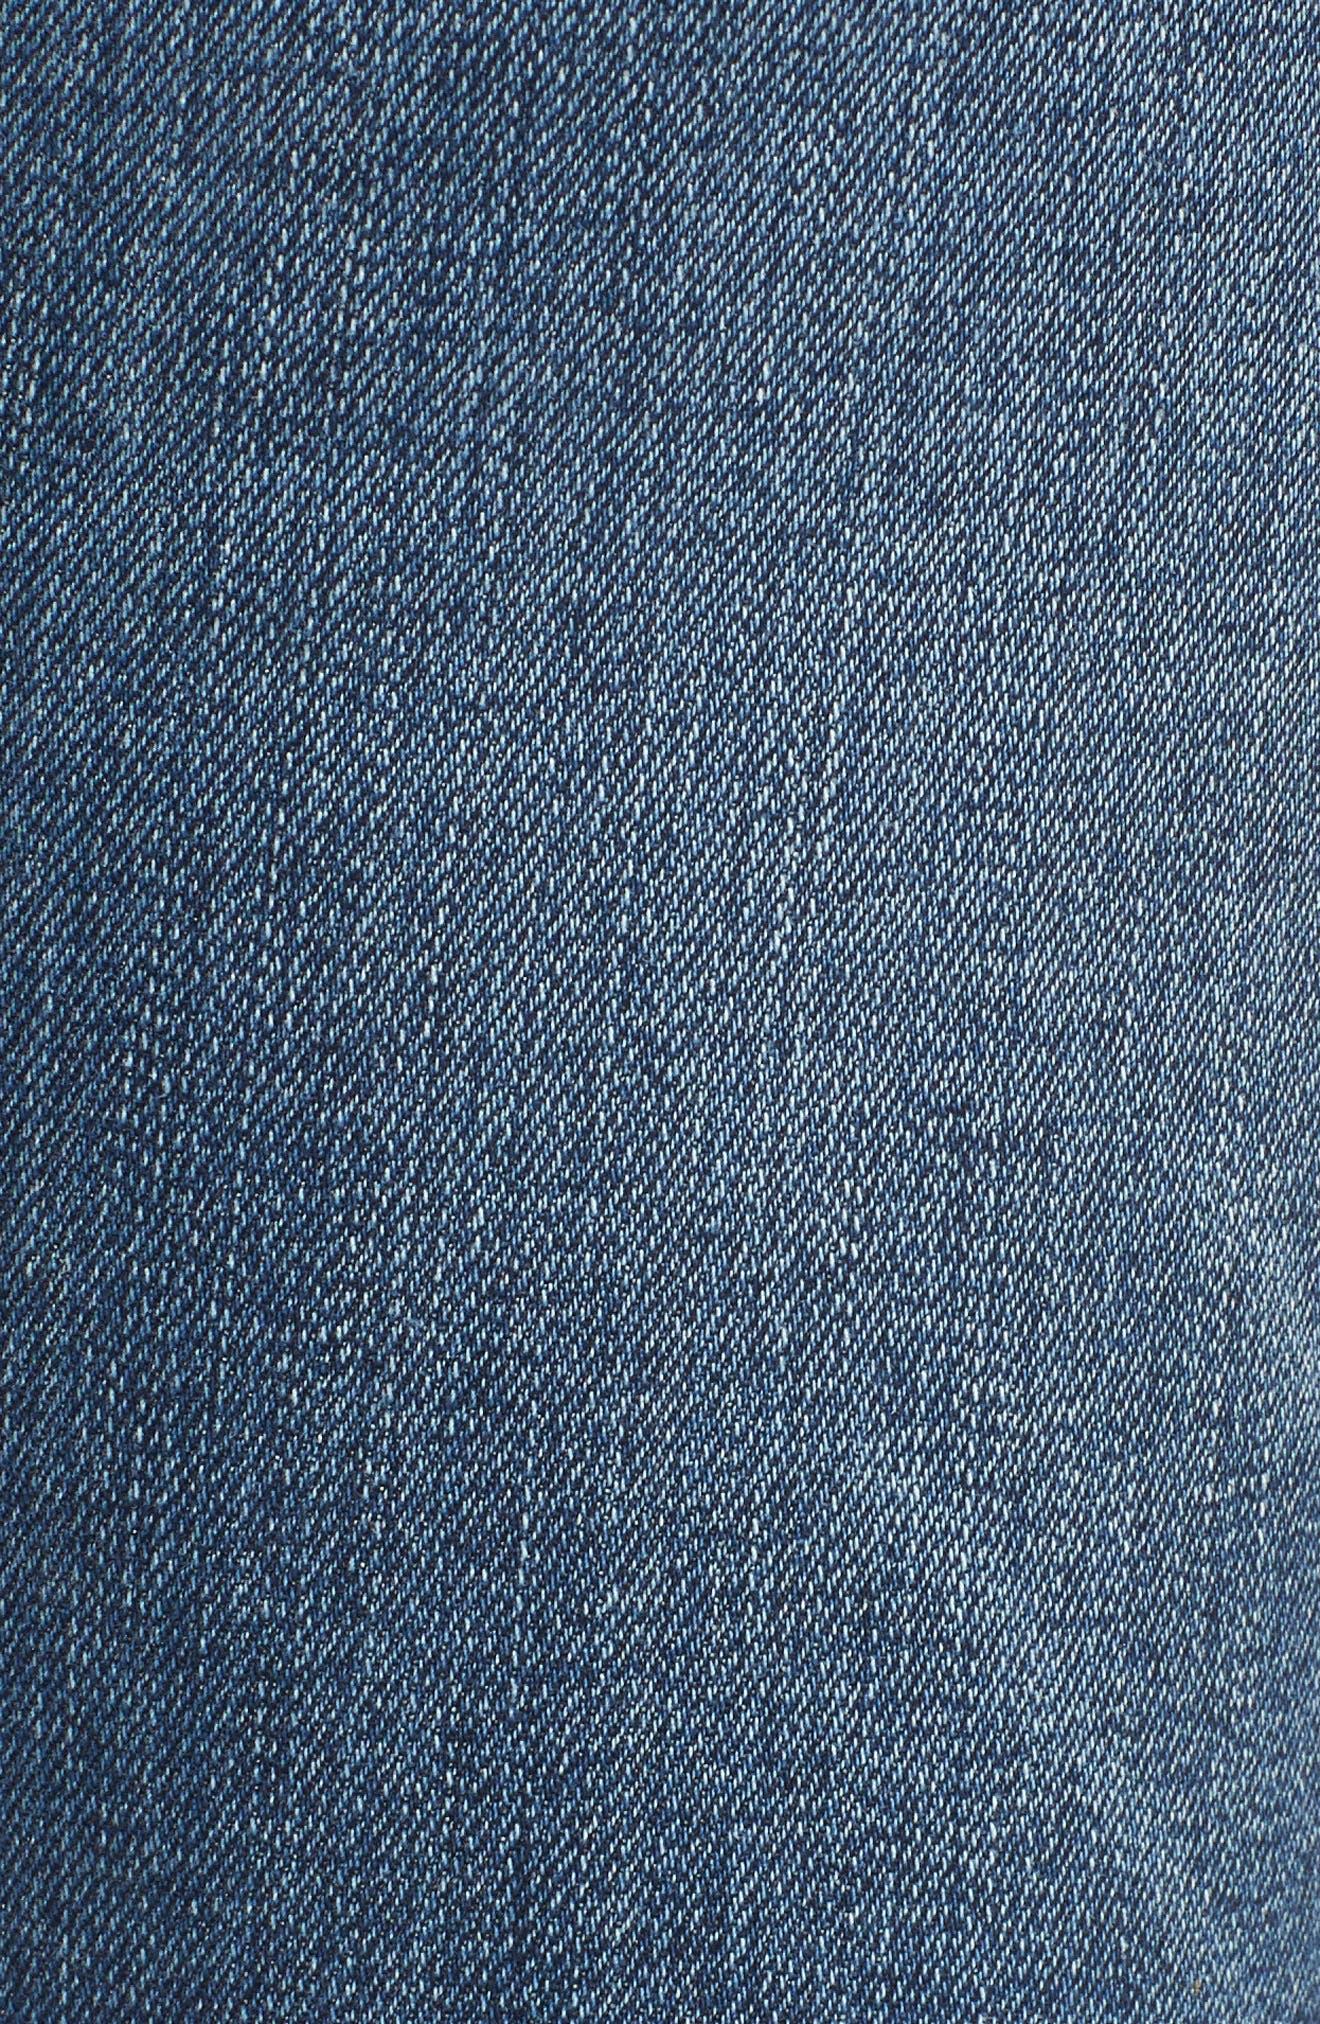 Hudson Barbara High Waist Ankle Skinny Jeans,                             Alternate thumbnail 6, color,                             CONTENDER